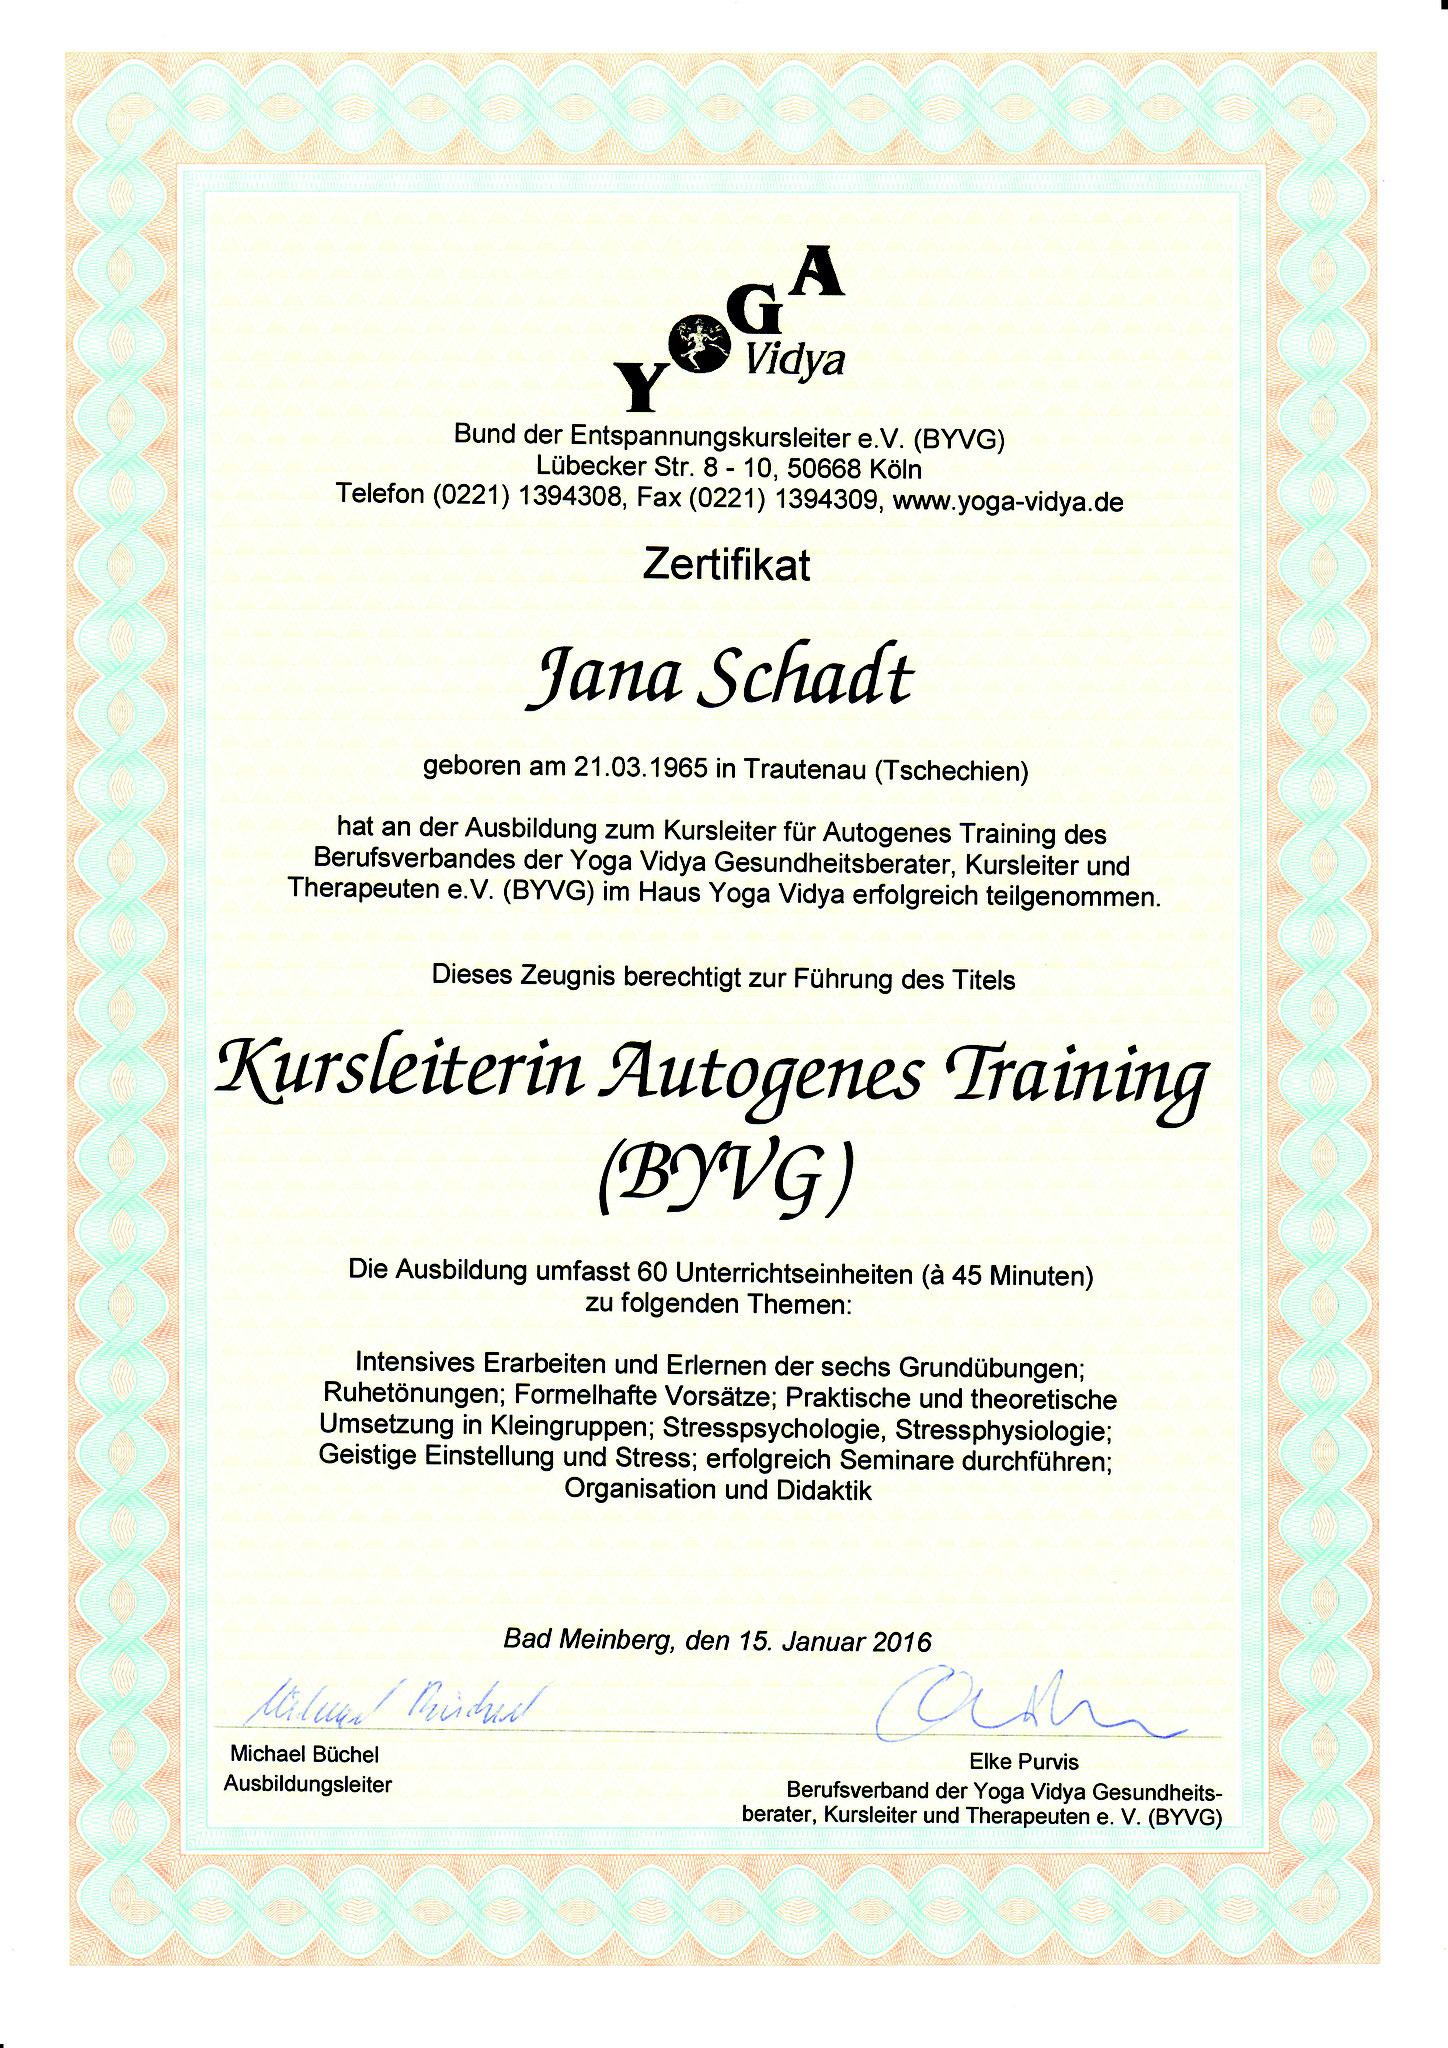 Jana Schadt Autogenes Training